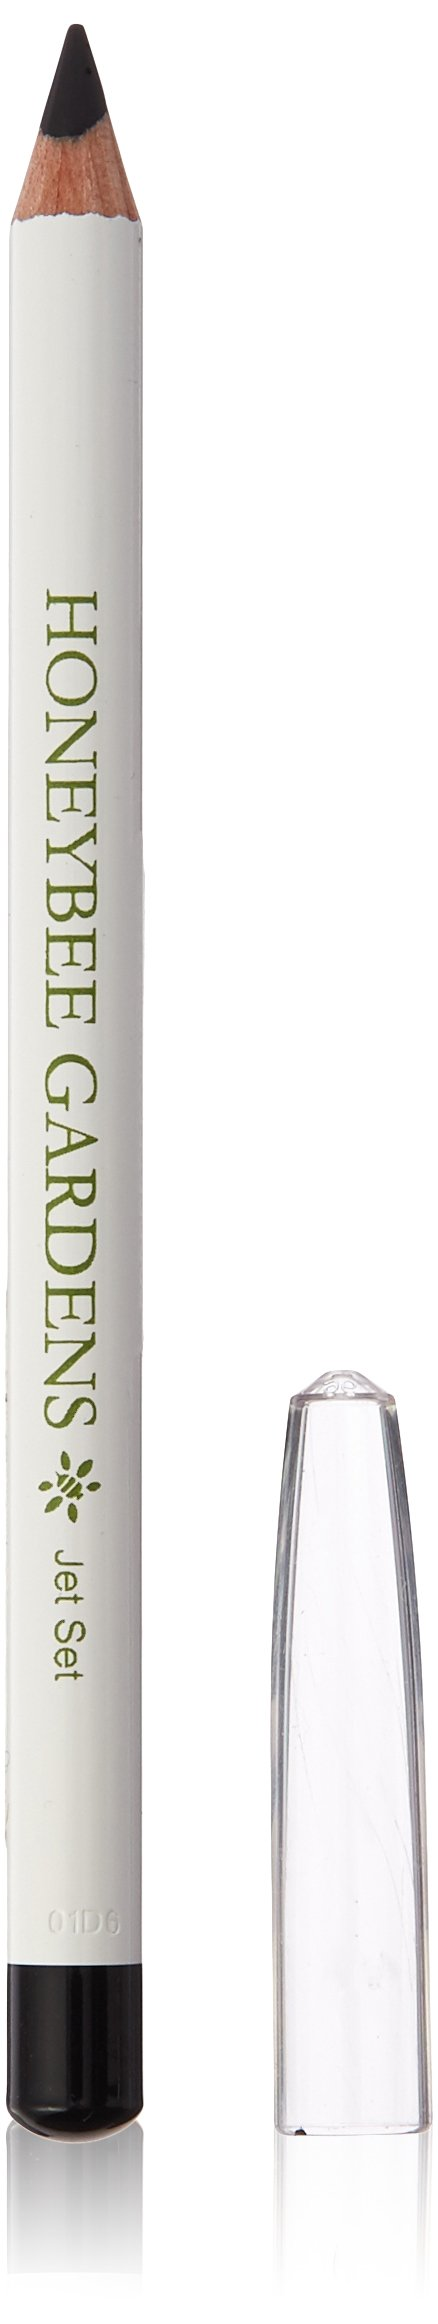 Honeybee Gardens Jobacolors Vegan Gluten-Free Jet Set Black Effortless Eye Liner, 0.04 oz